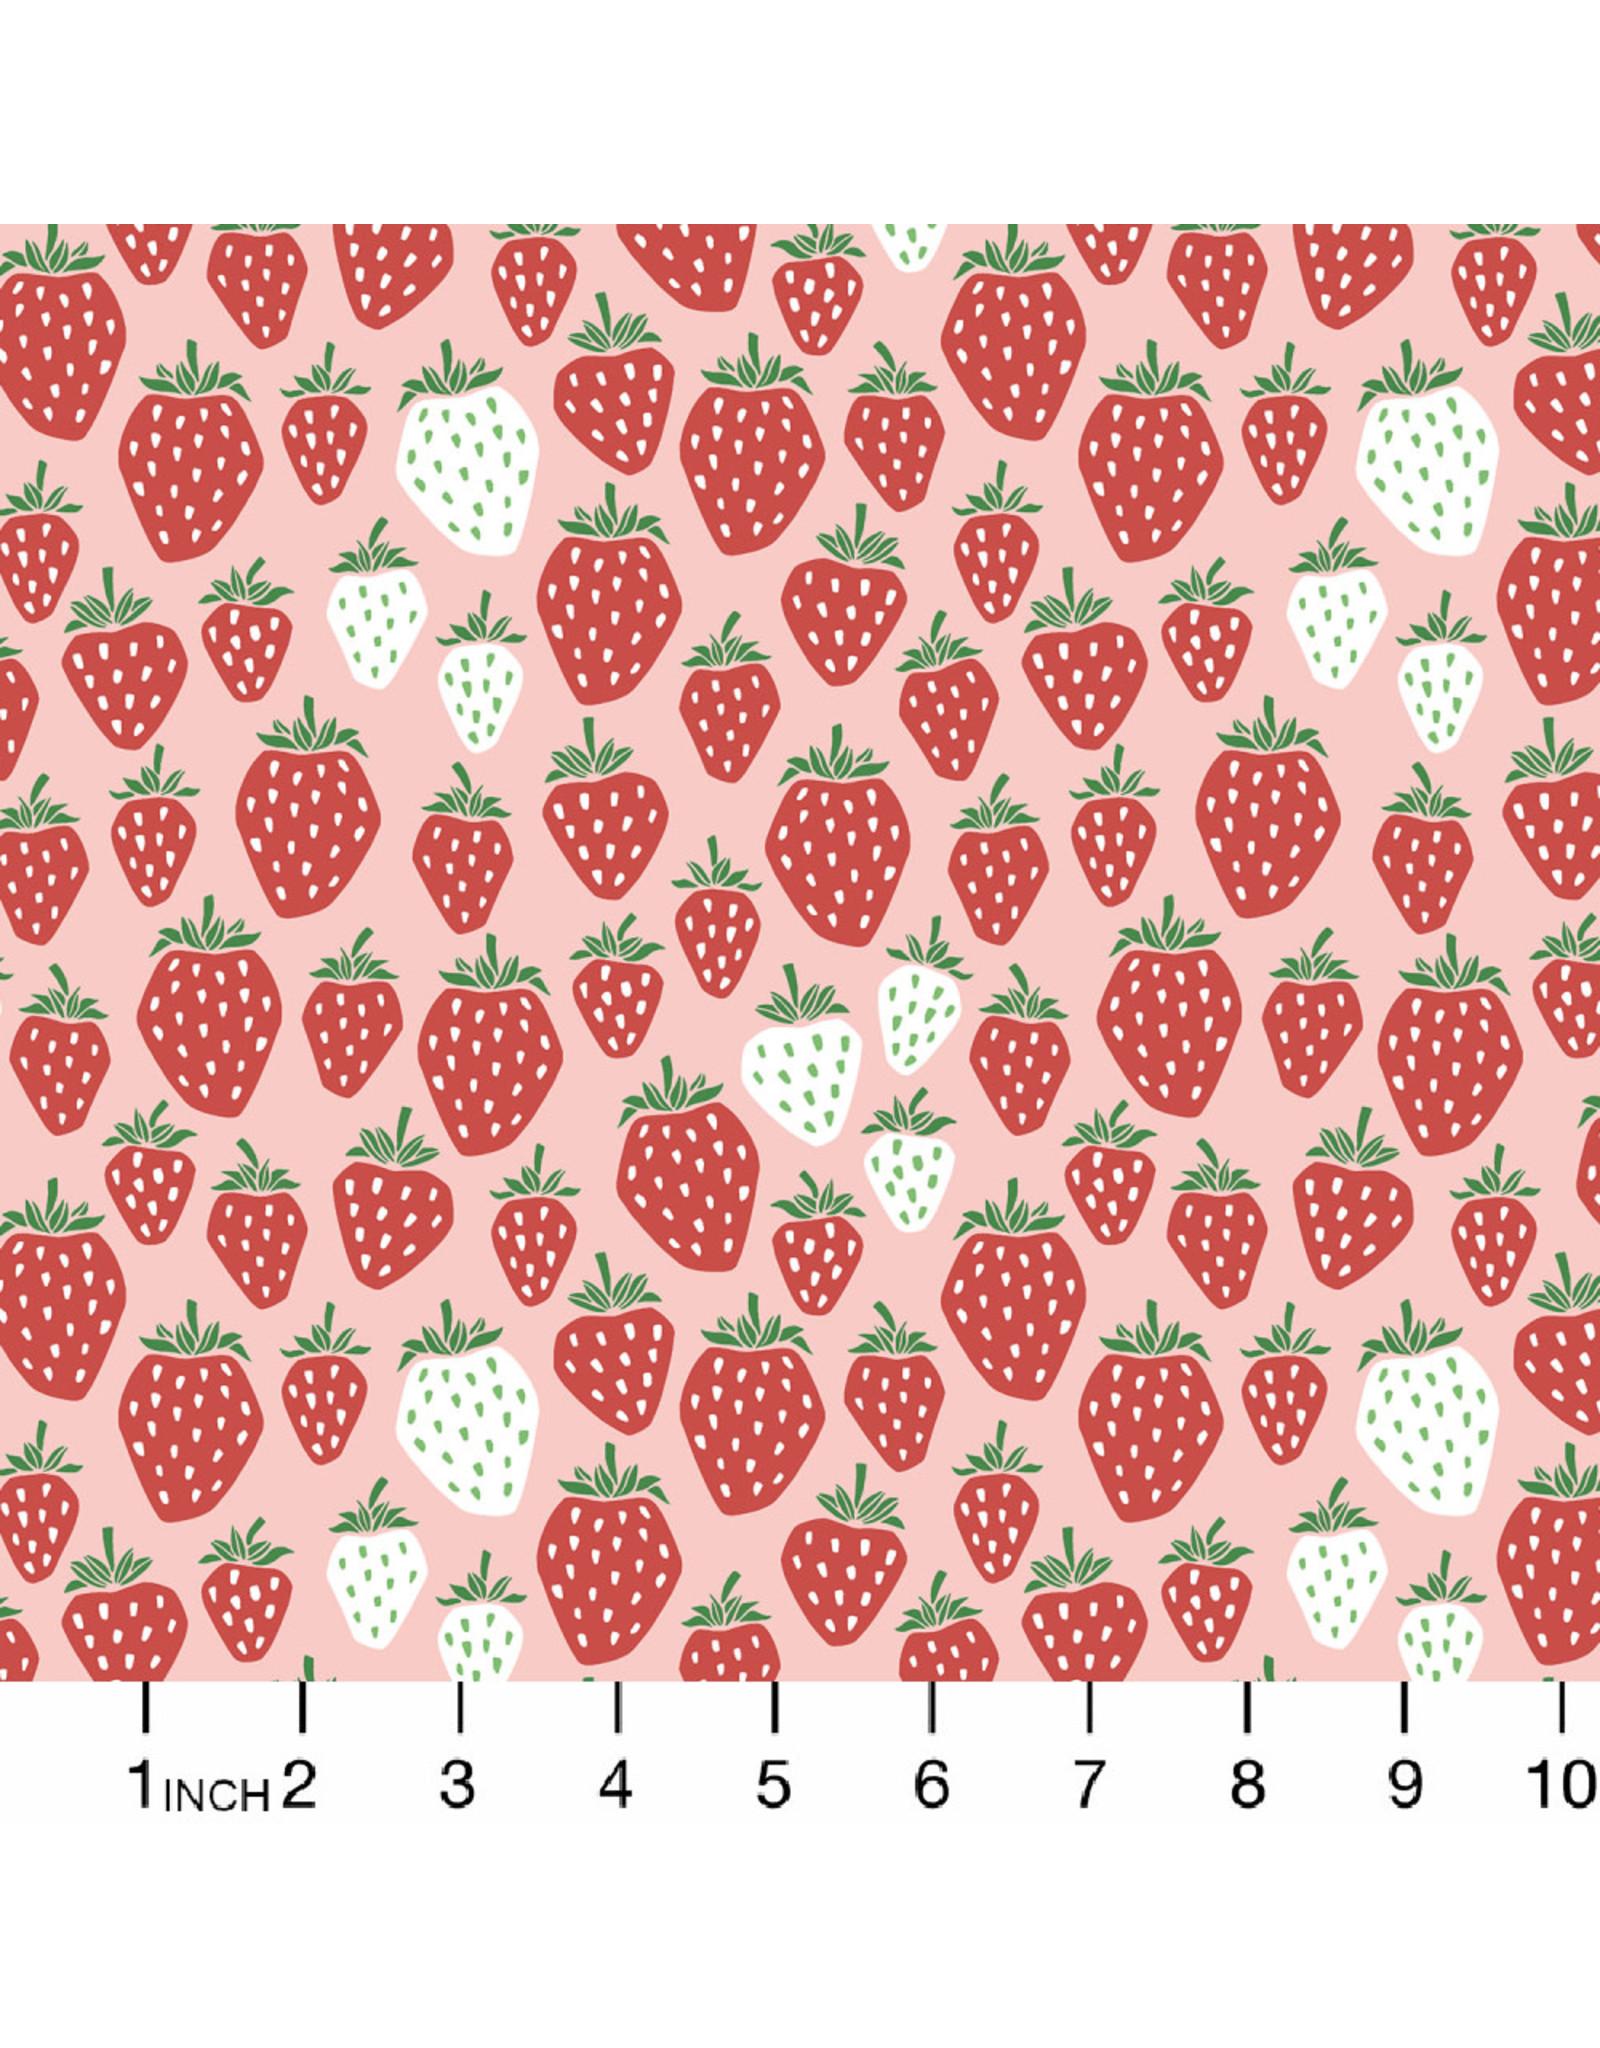 Cotton + Steel Under the Apple Tree, Queen of Berries in Summer Red, Fabric Half-Yards